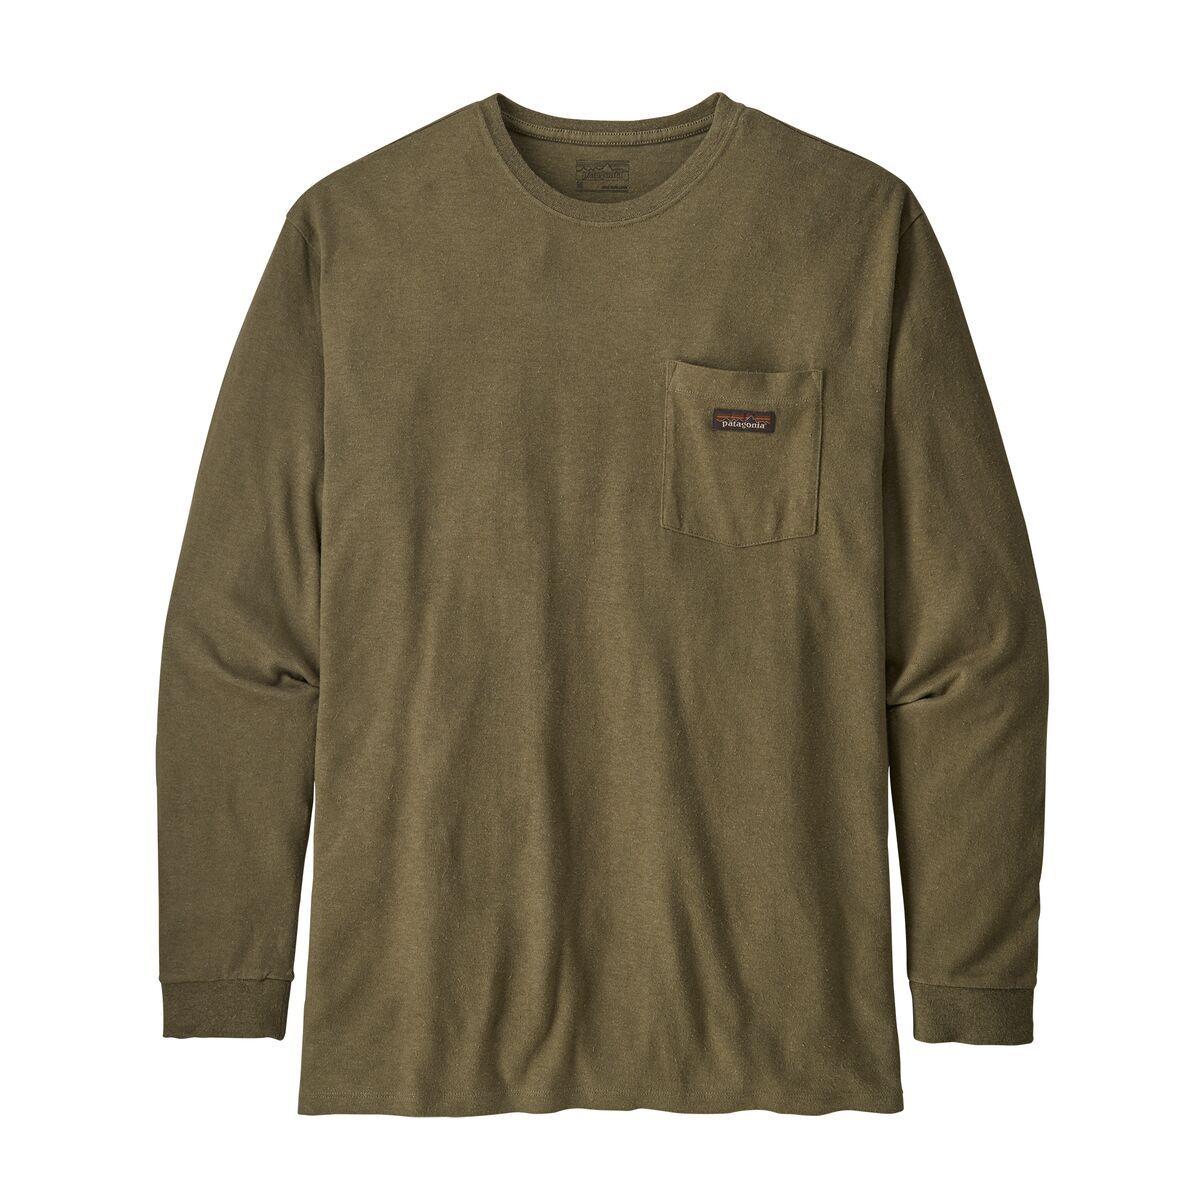 Men S Long Sleeved Work Pocket T Shirt Mens Tops Going Out